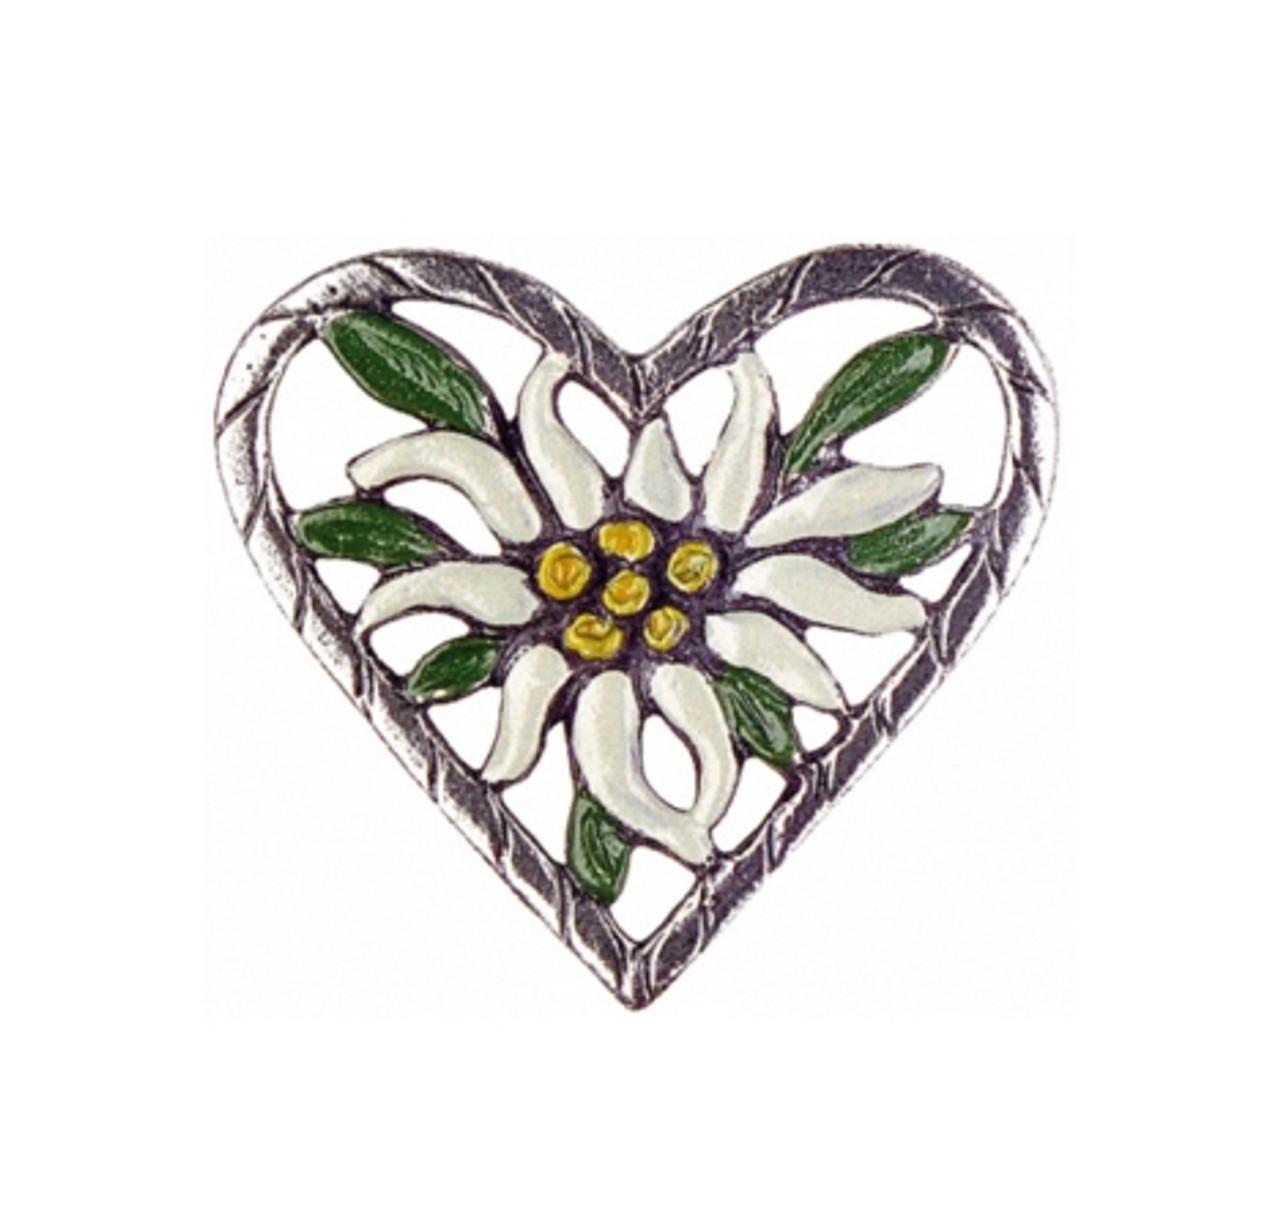 Edelweiss Heart German Pewter Pin